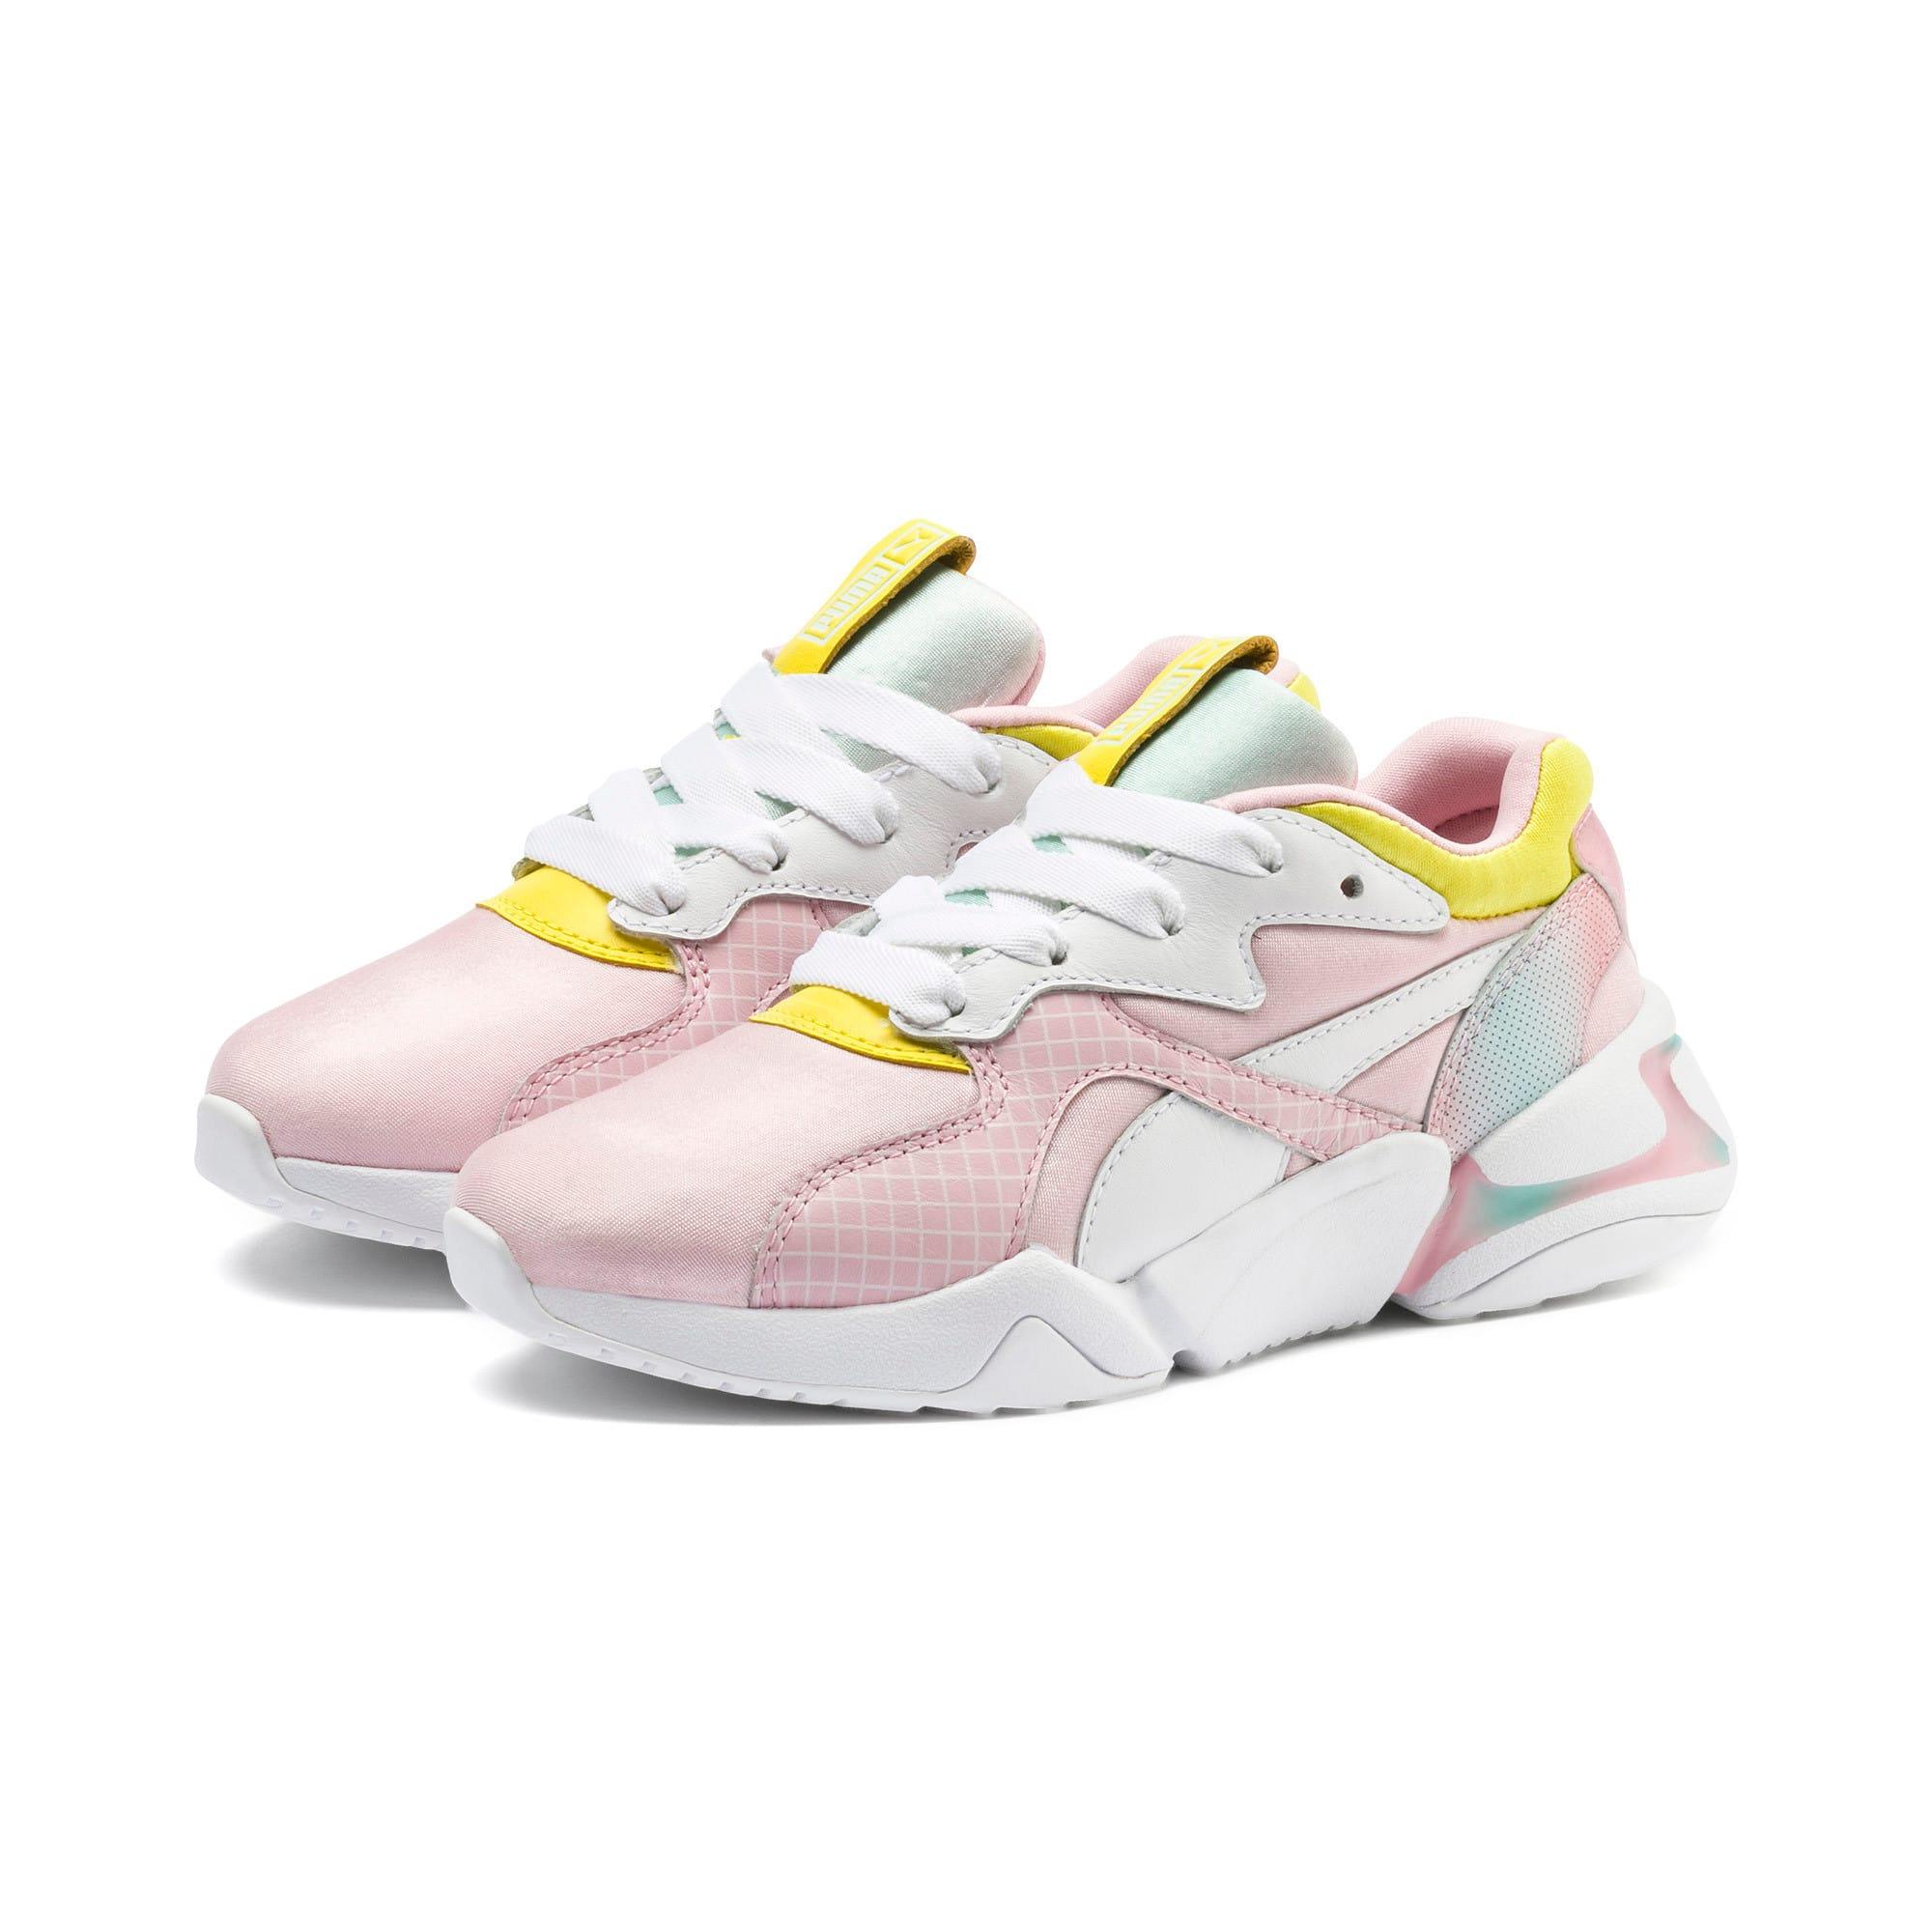 Thumbnail 2 of Nova x Barbie Little Kids' Shoes, Orchid Pink-Puma White, medium